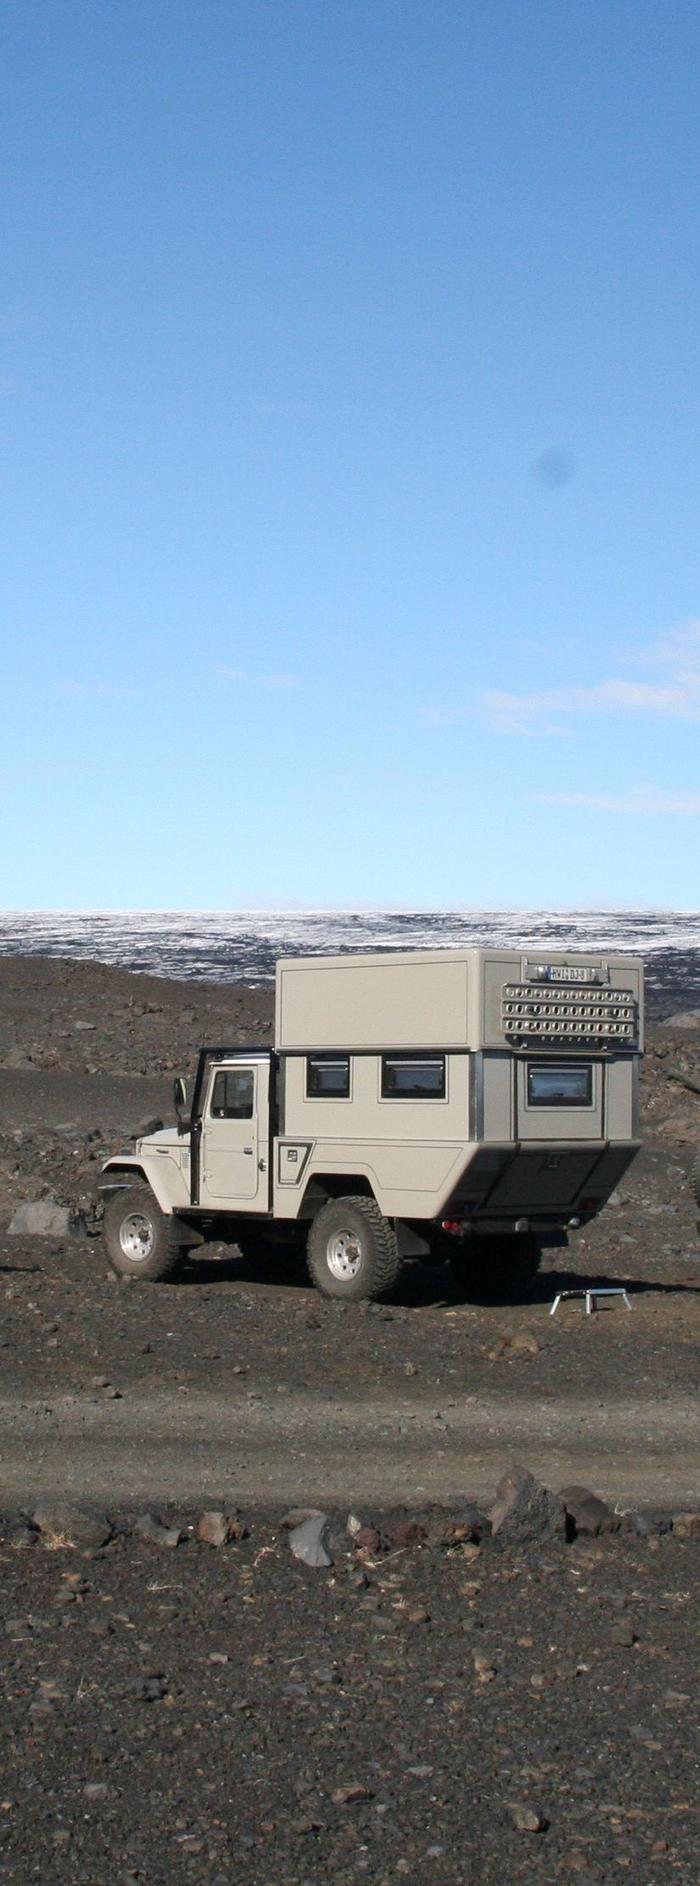 Best expedition vehicle ever fj40 landcruiser body work on a fj80 frame custom built